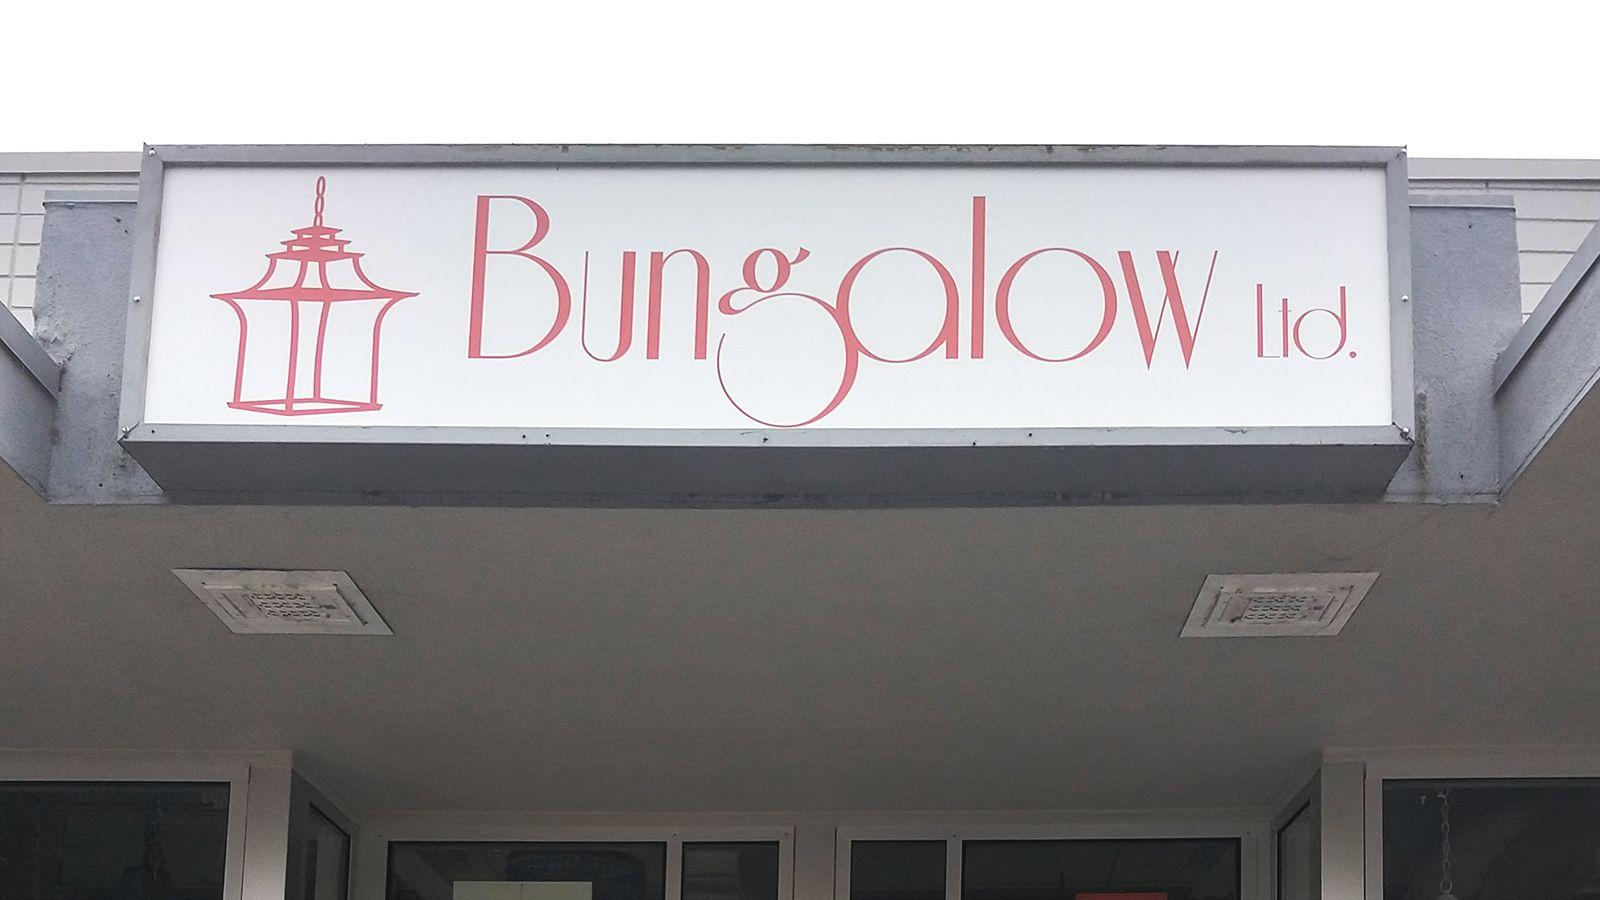 Bungalow ltd light box sign